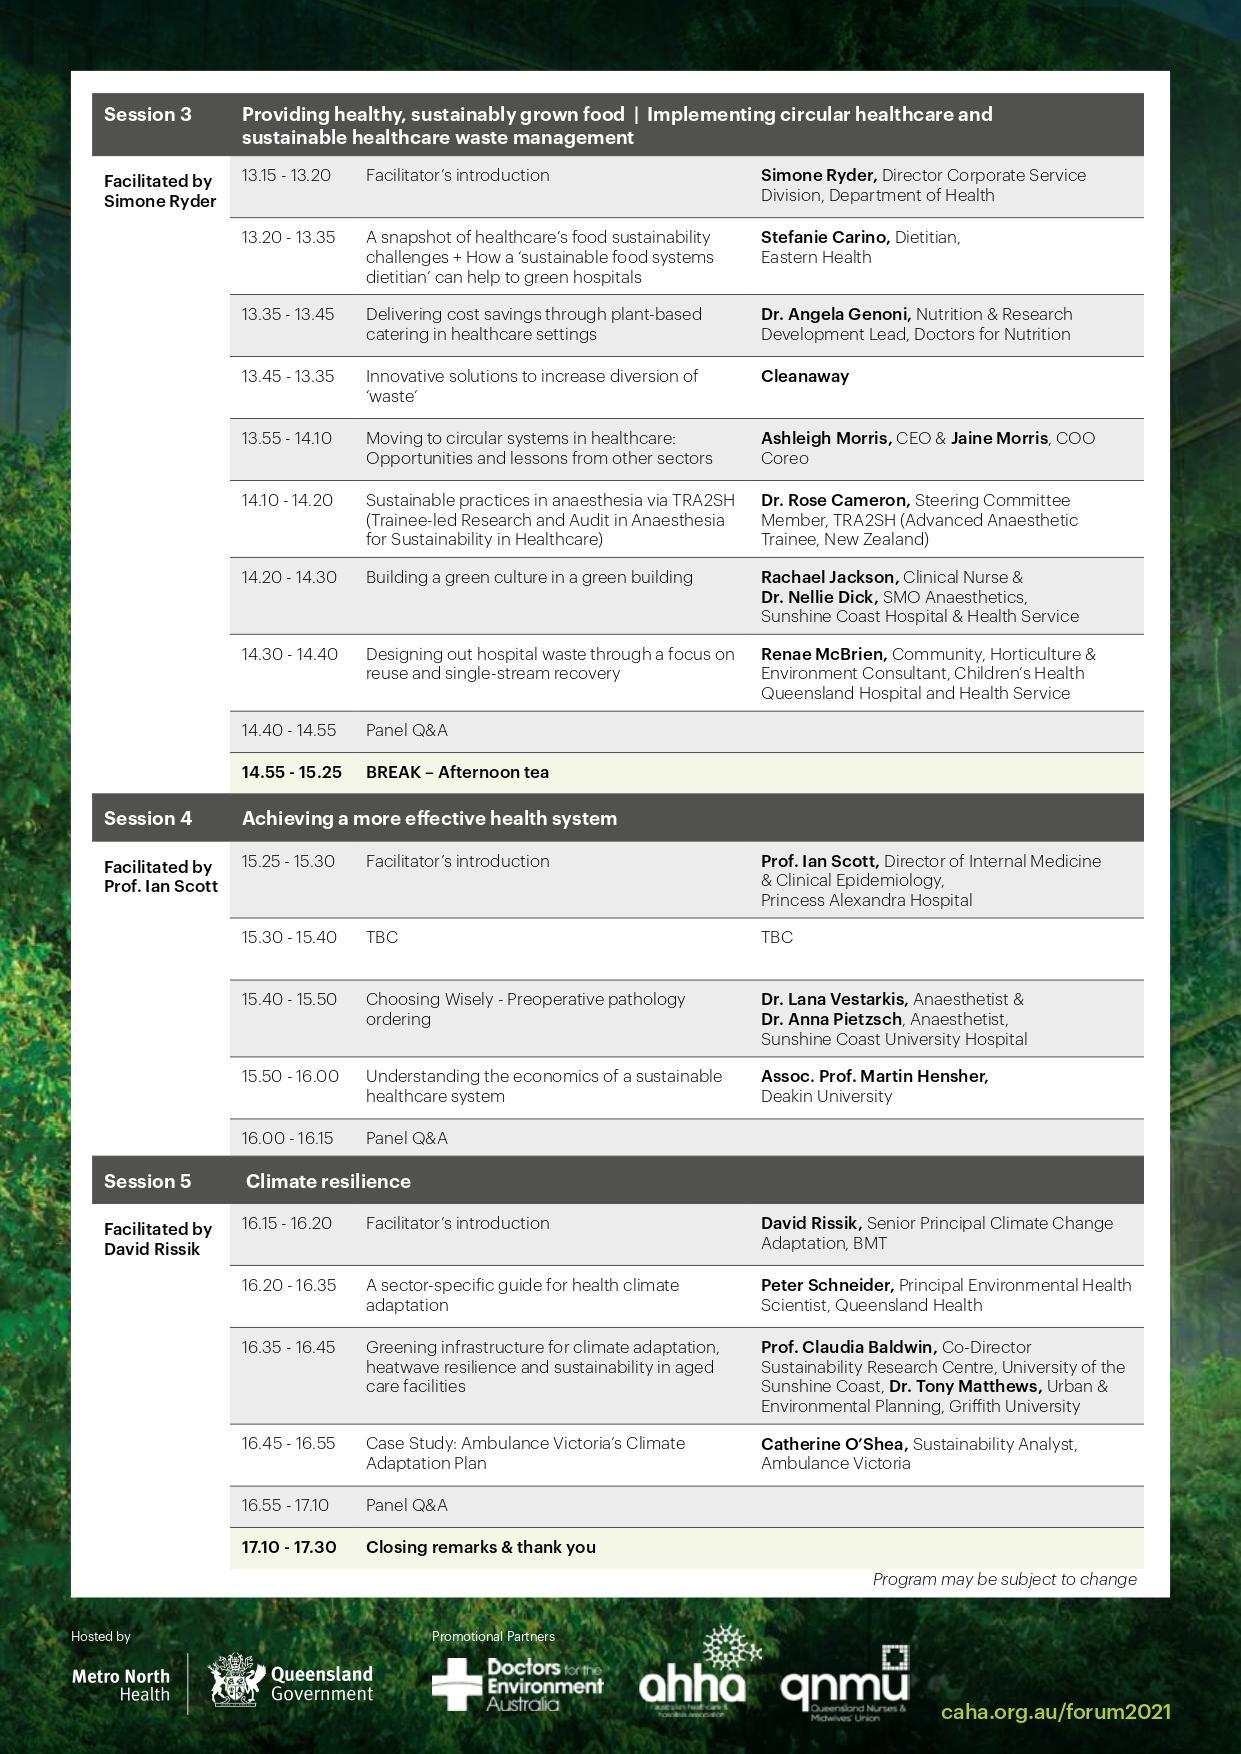 Page 2: Program